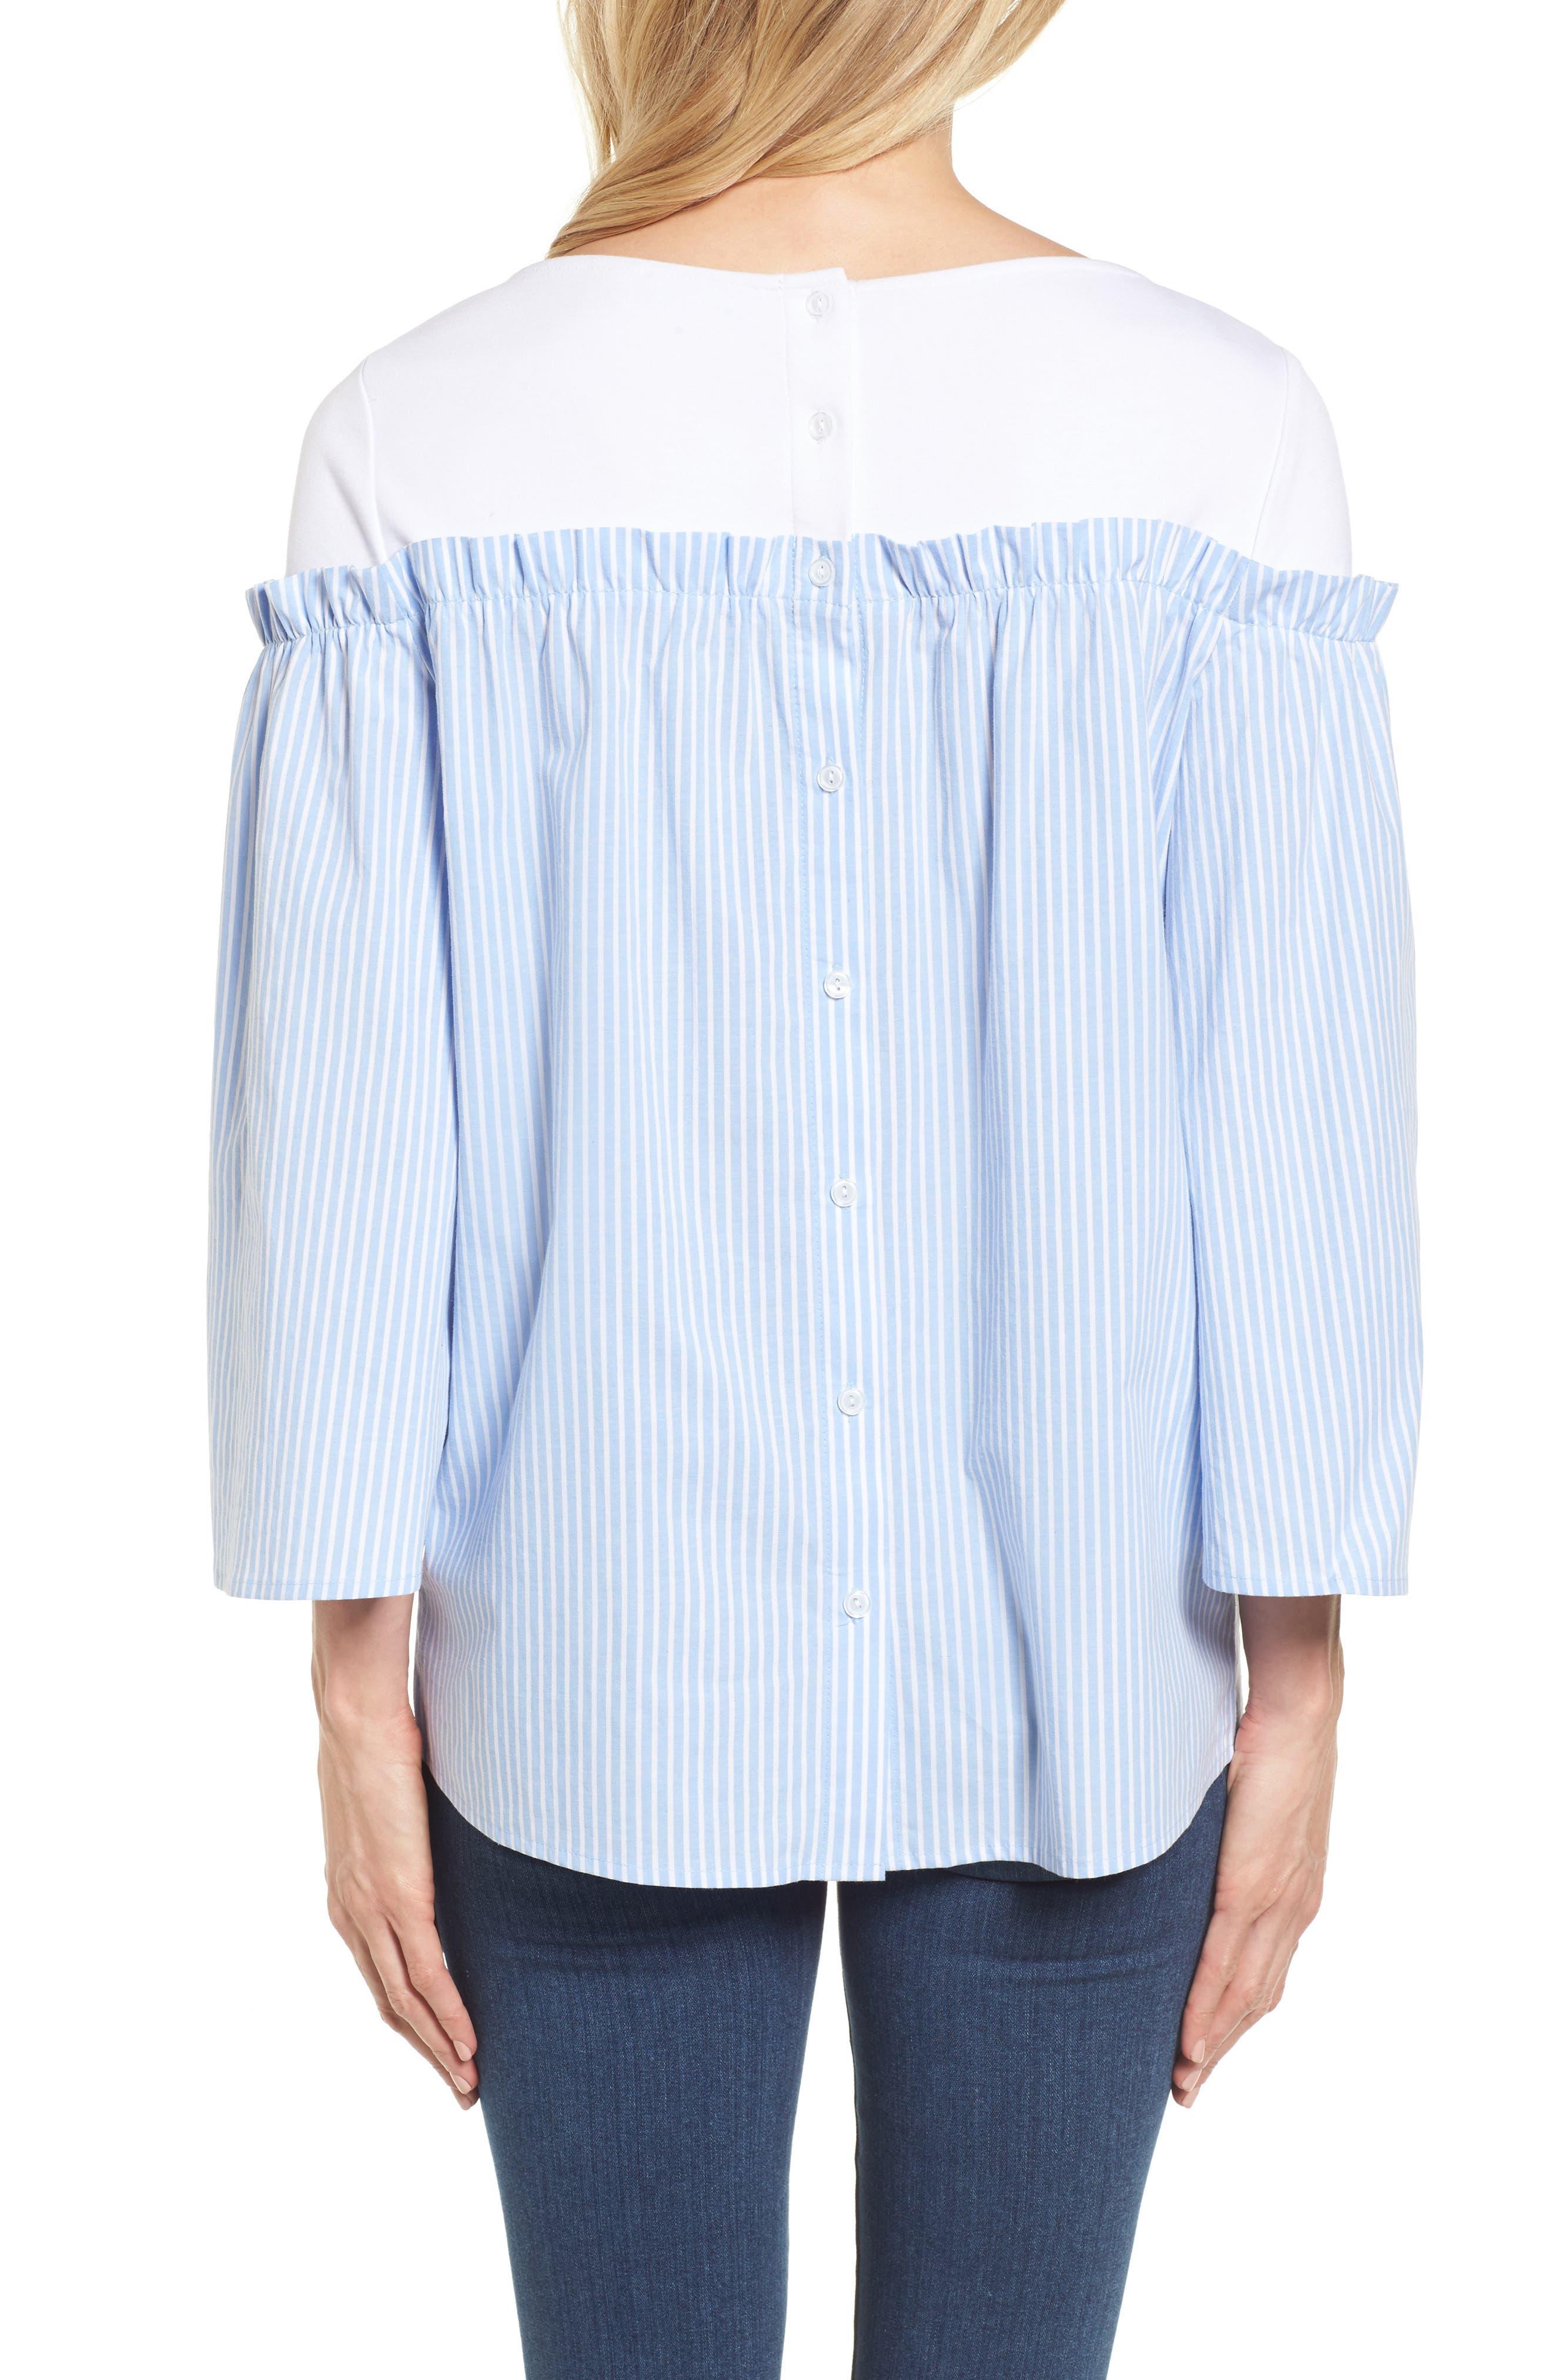 Ruffle Detail Mix Media High/Low Shirt,                             Alternate thumbnail 2, color,                             Blue- White Stripe